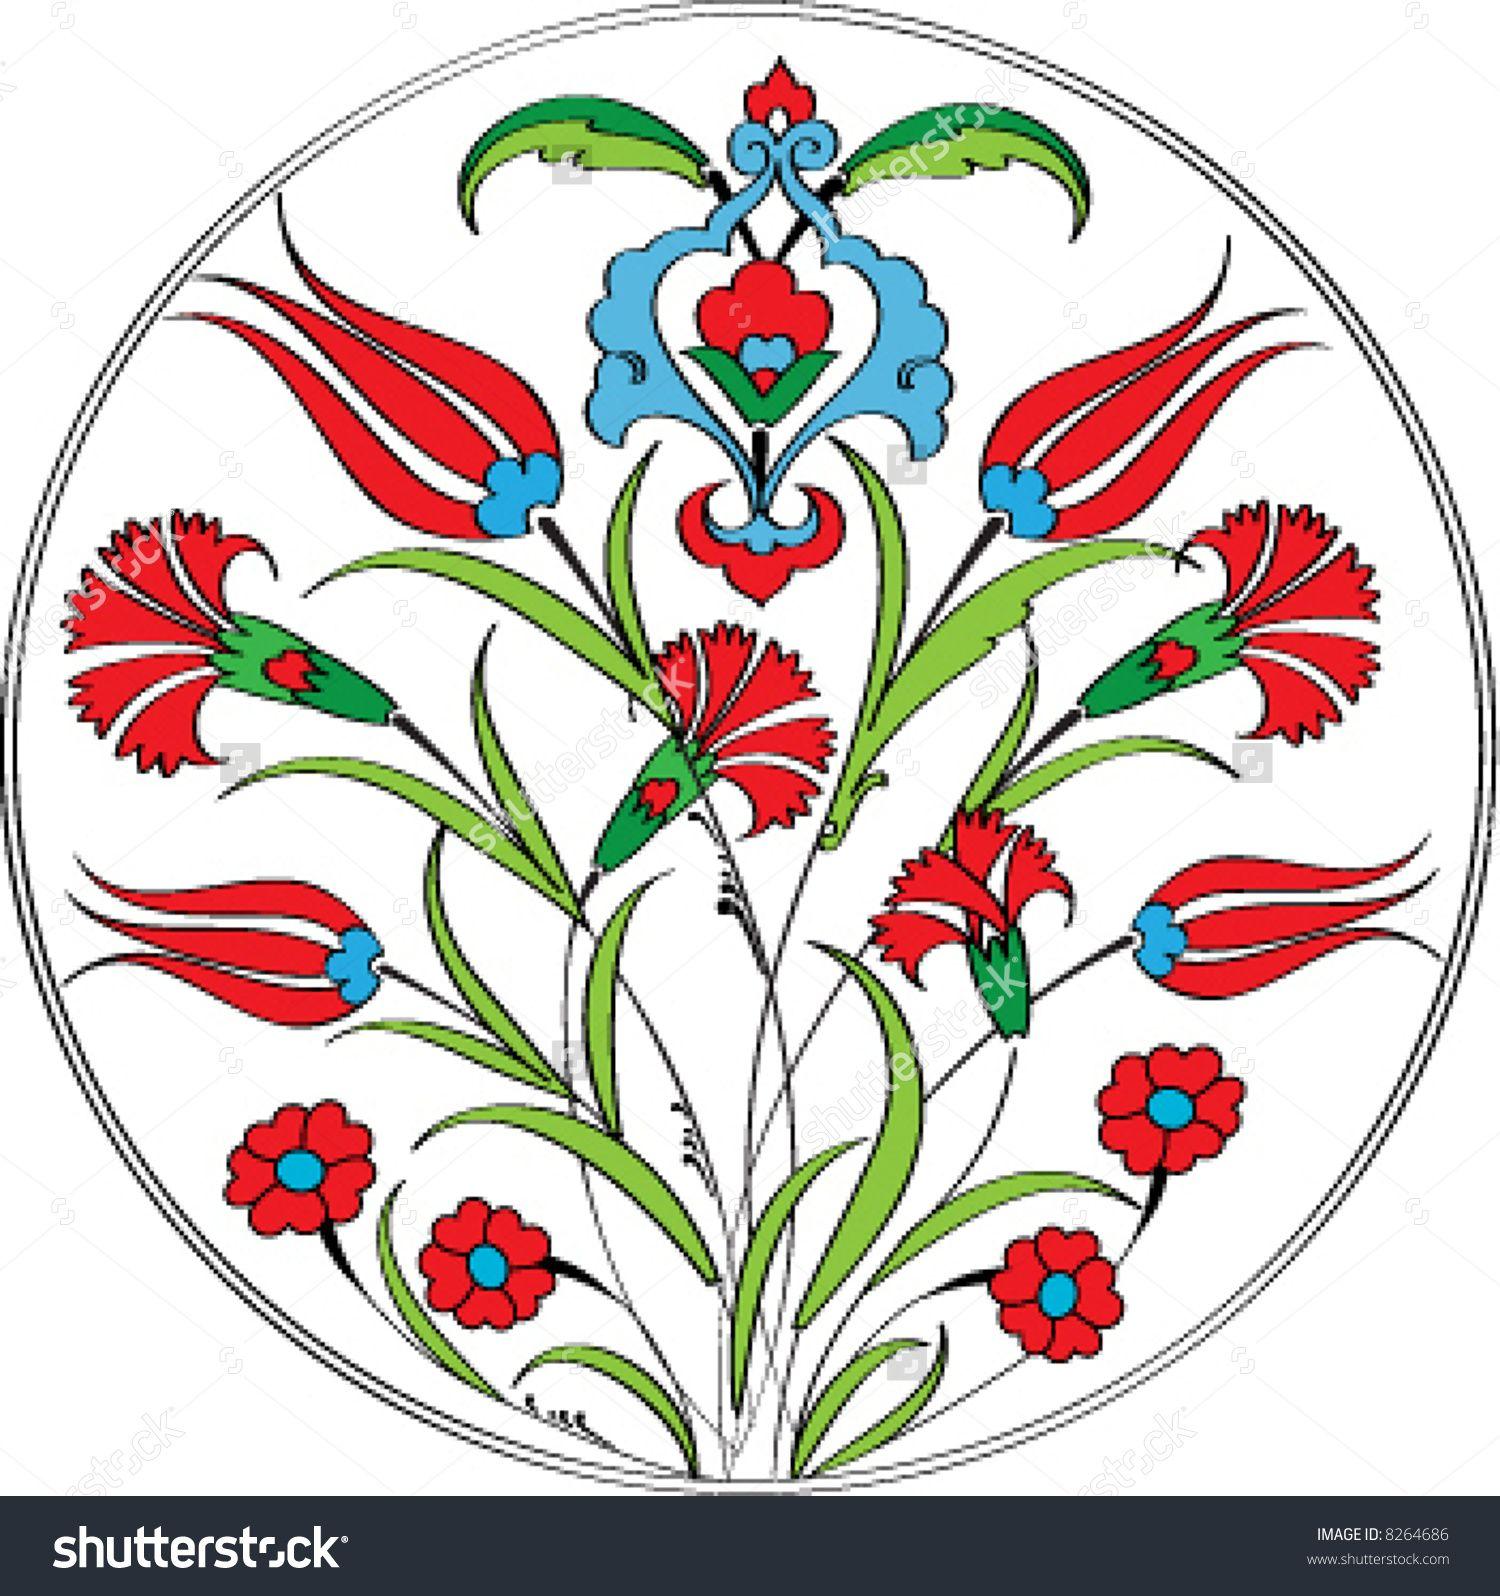 Traditional Turkish Ottoman Red Flower Home Decor Mosaic: Ottoman Tulip Stock Vectors & Vector Clip Art